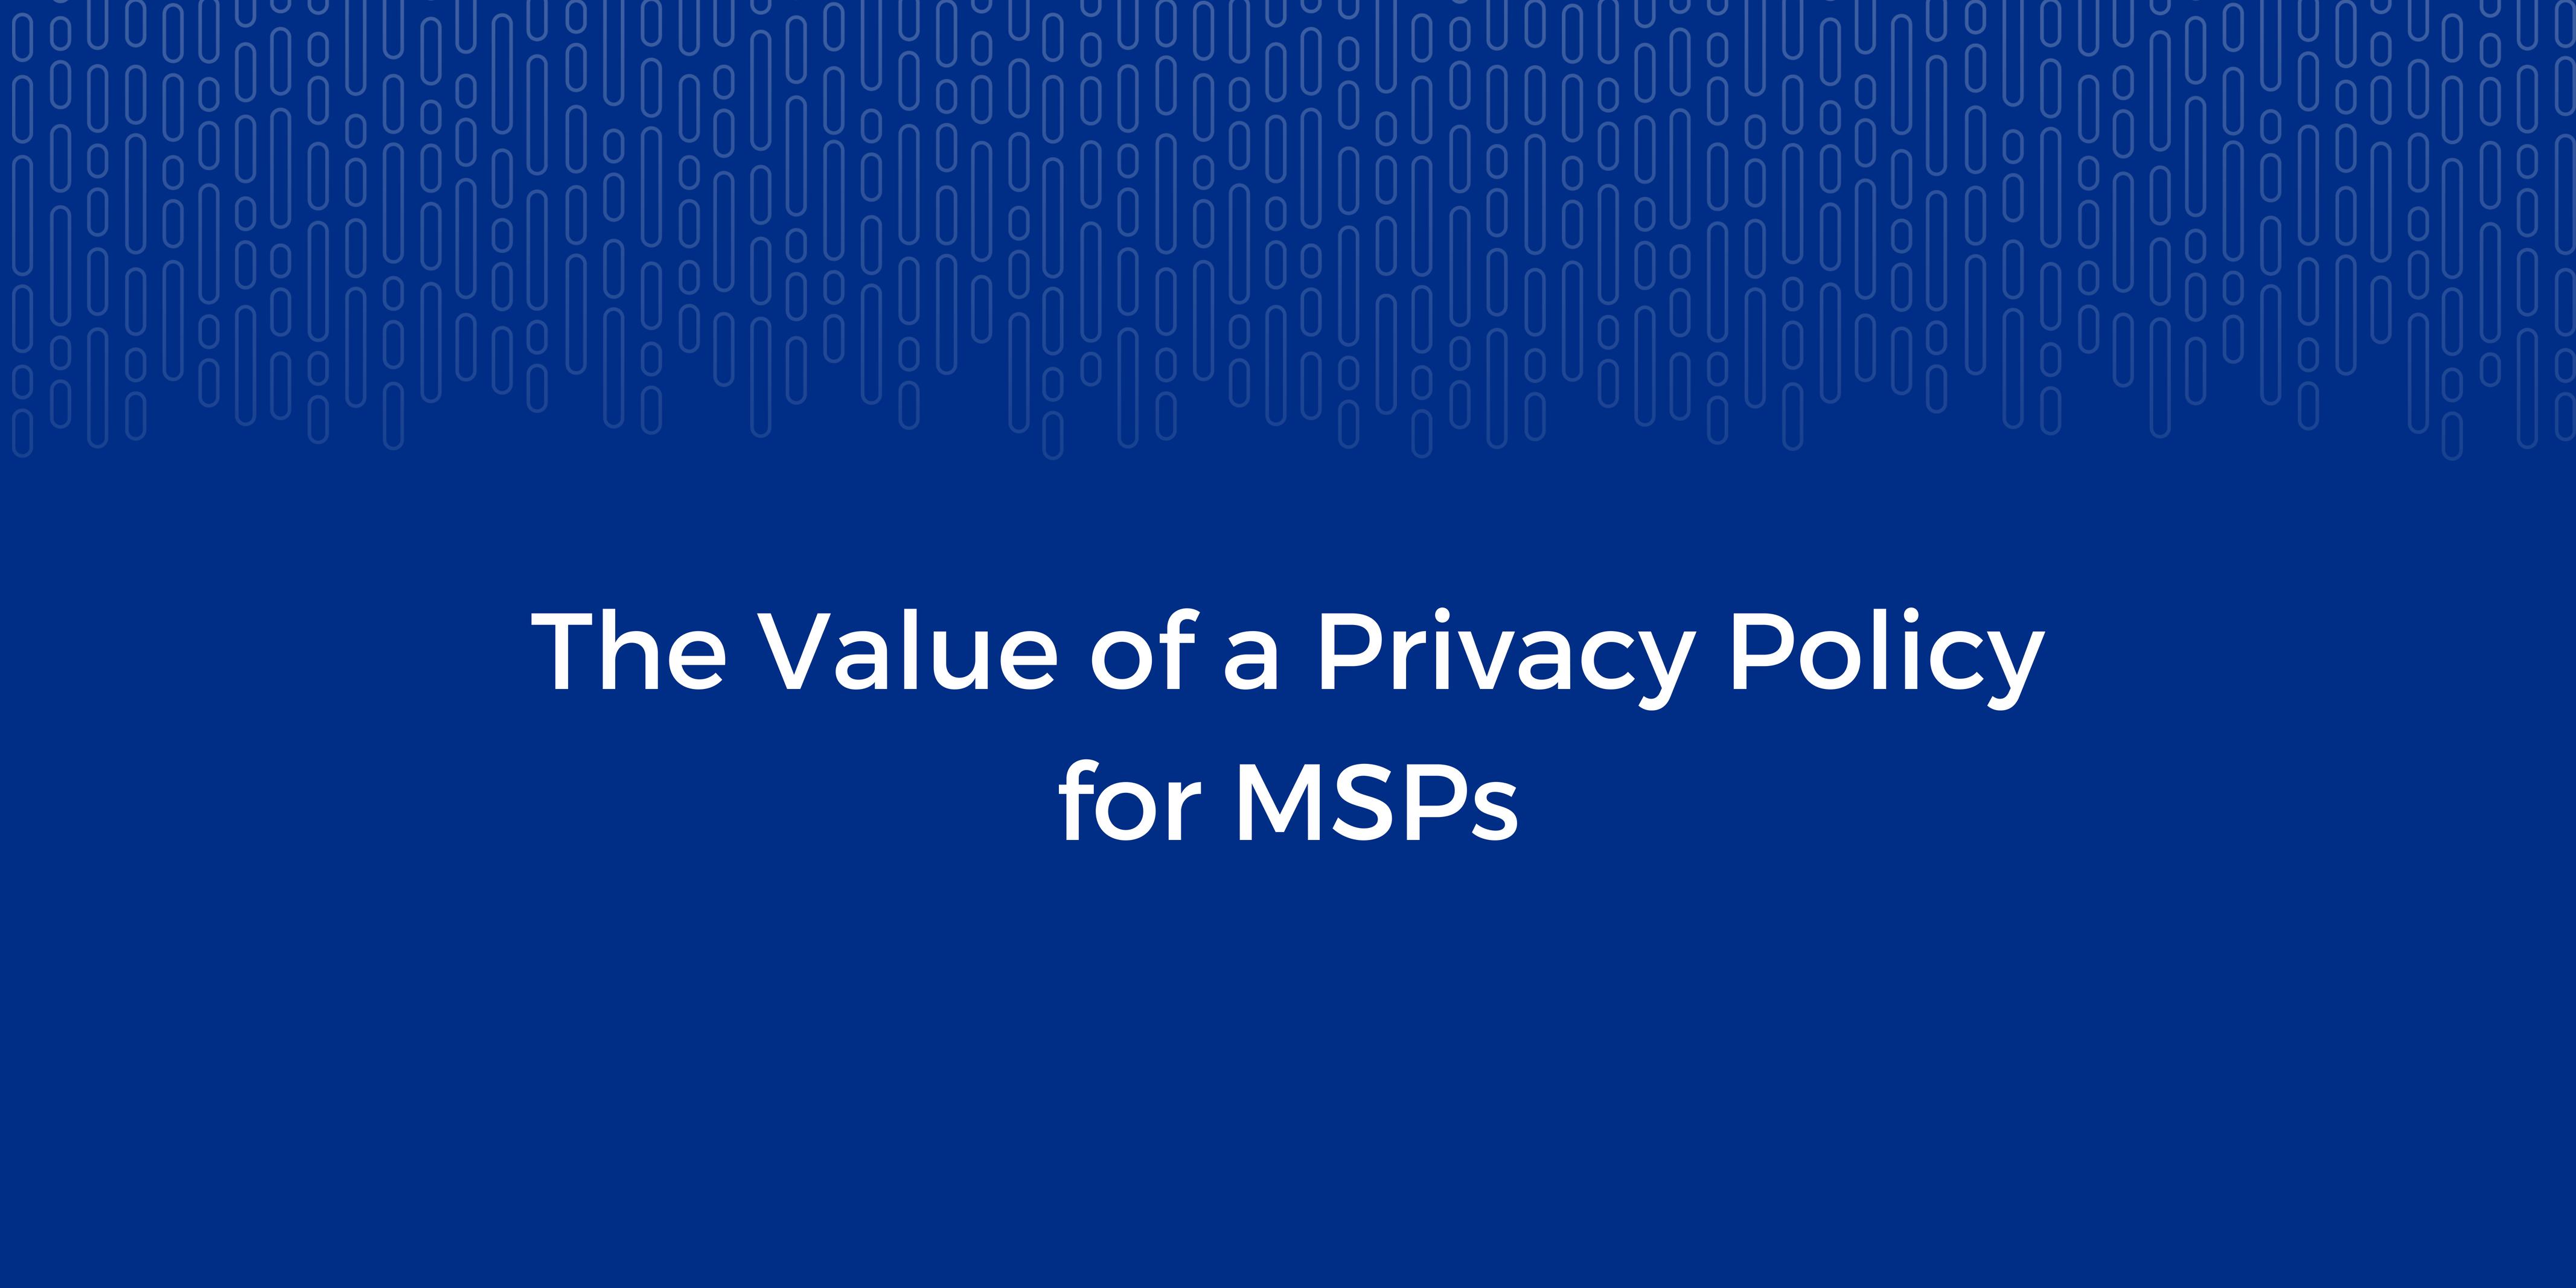 Privacypolicy-blogbanner3